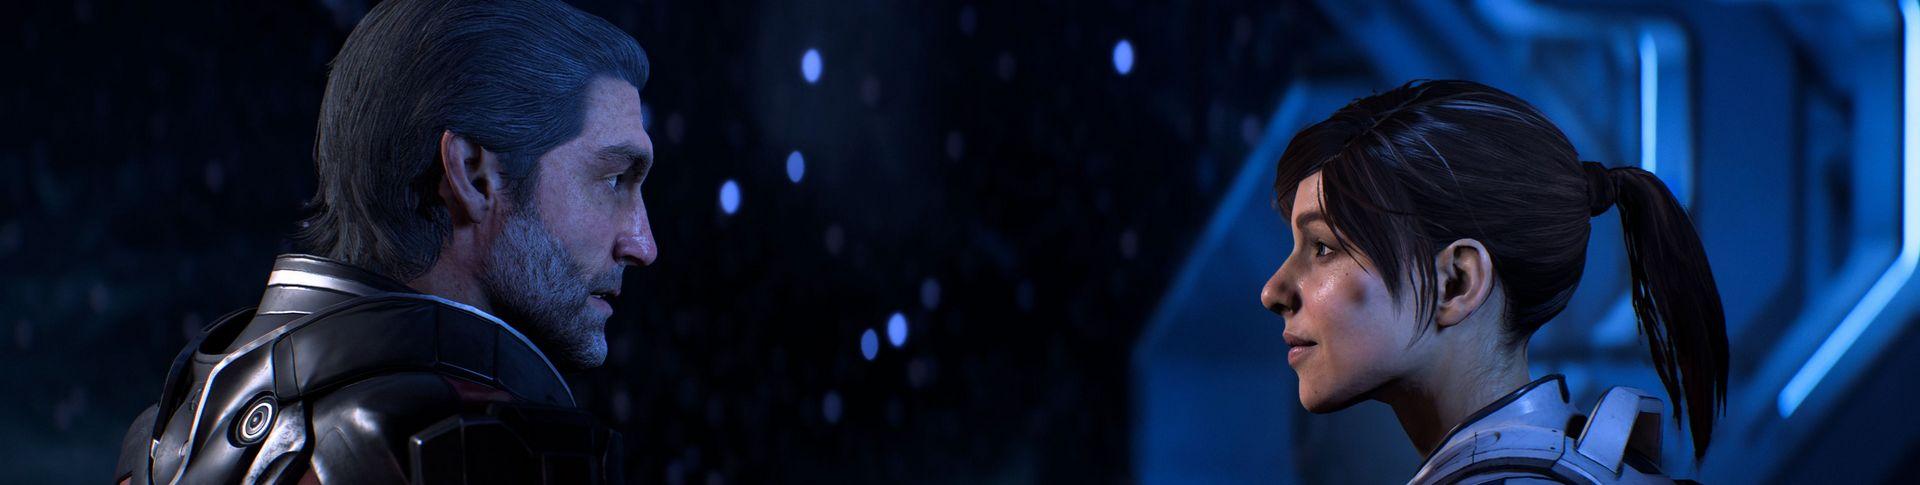 Mass Effect Andromeda : preview du jeu